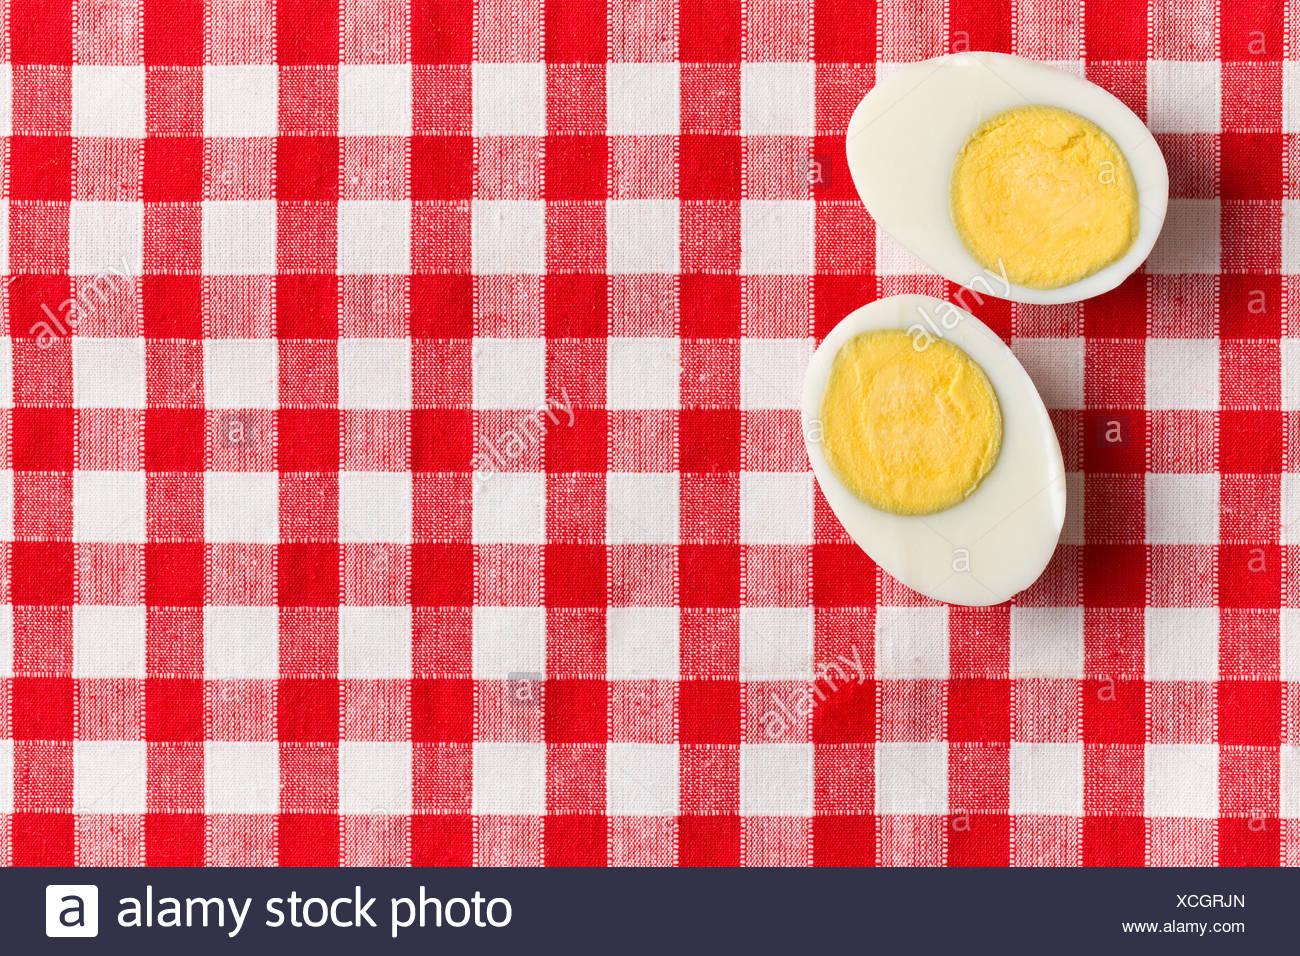 Yolk Of An Egg Stockfotos & Yolk Of An Egg Bilder - Seite 31 - Alamy